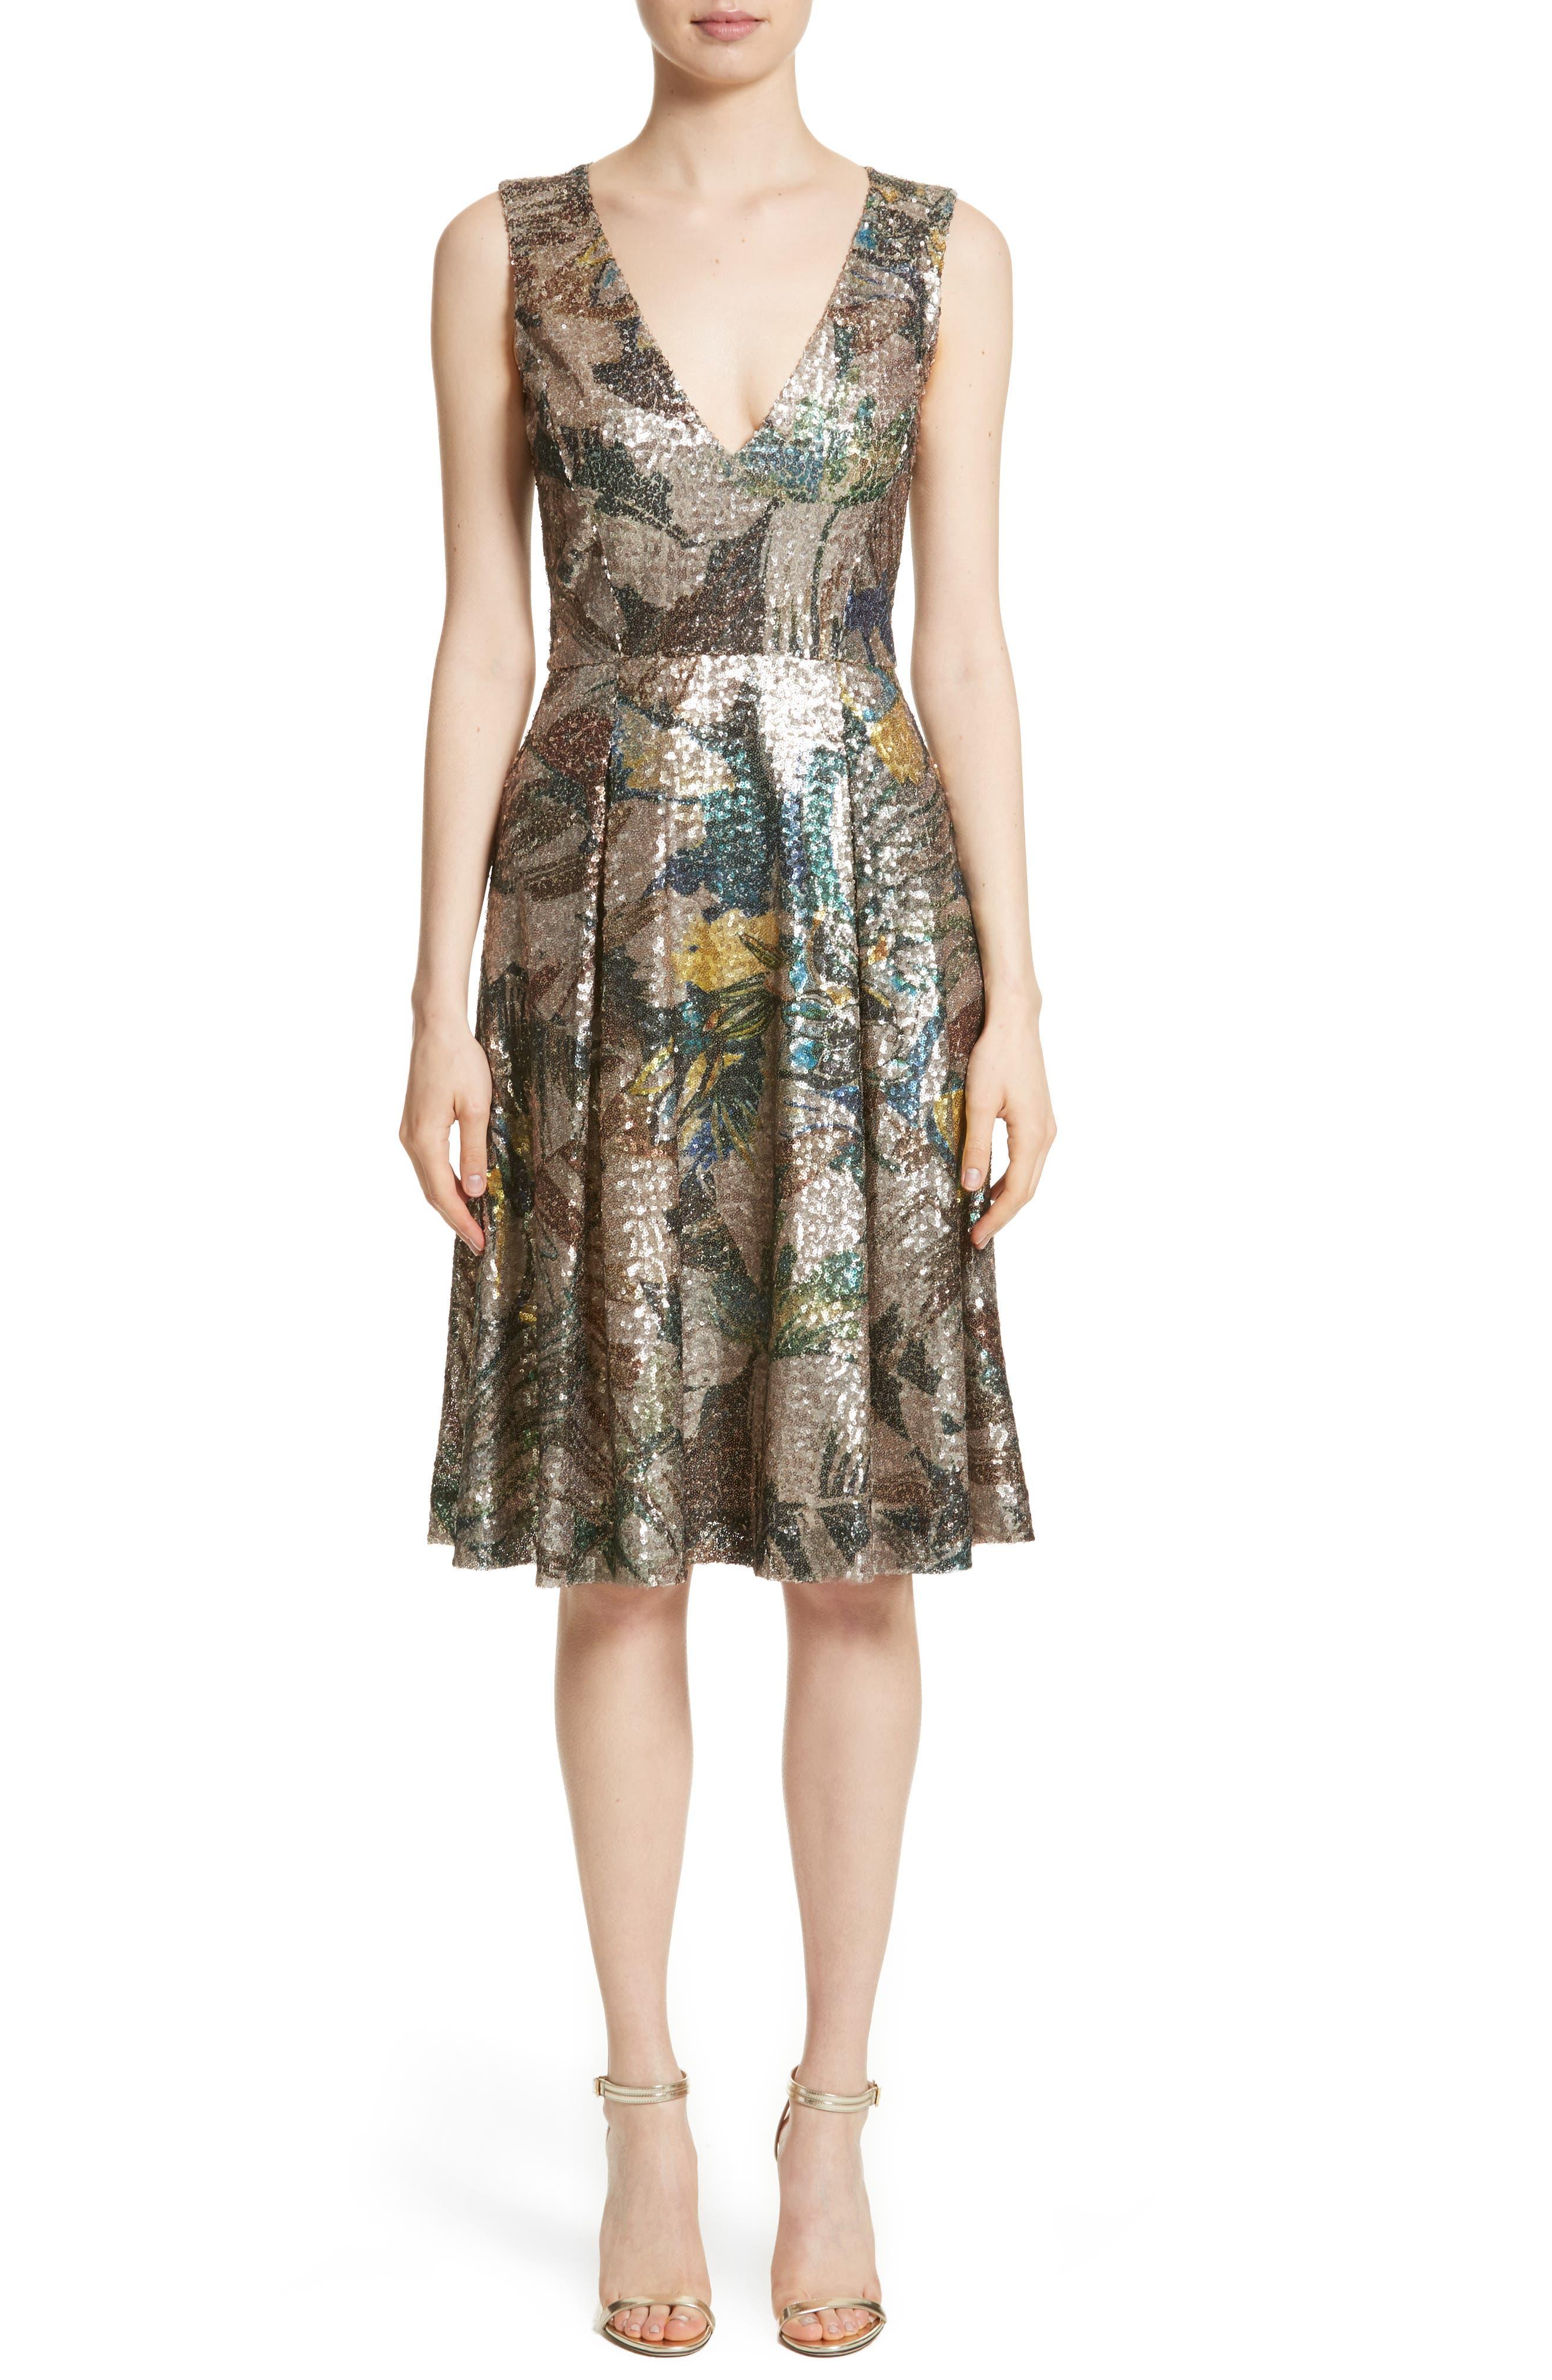 Carolina Herrera Sequin Fit & Flare Dress